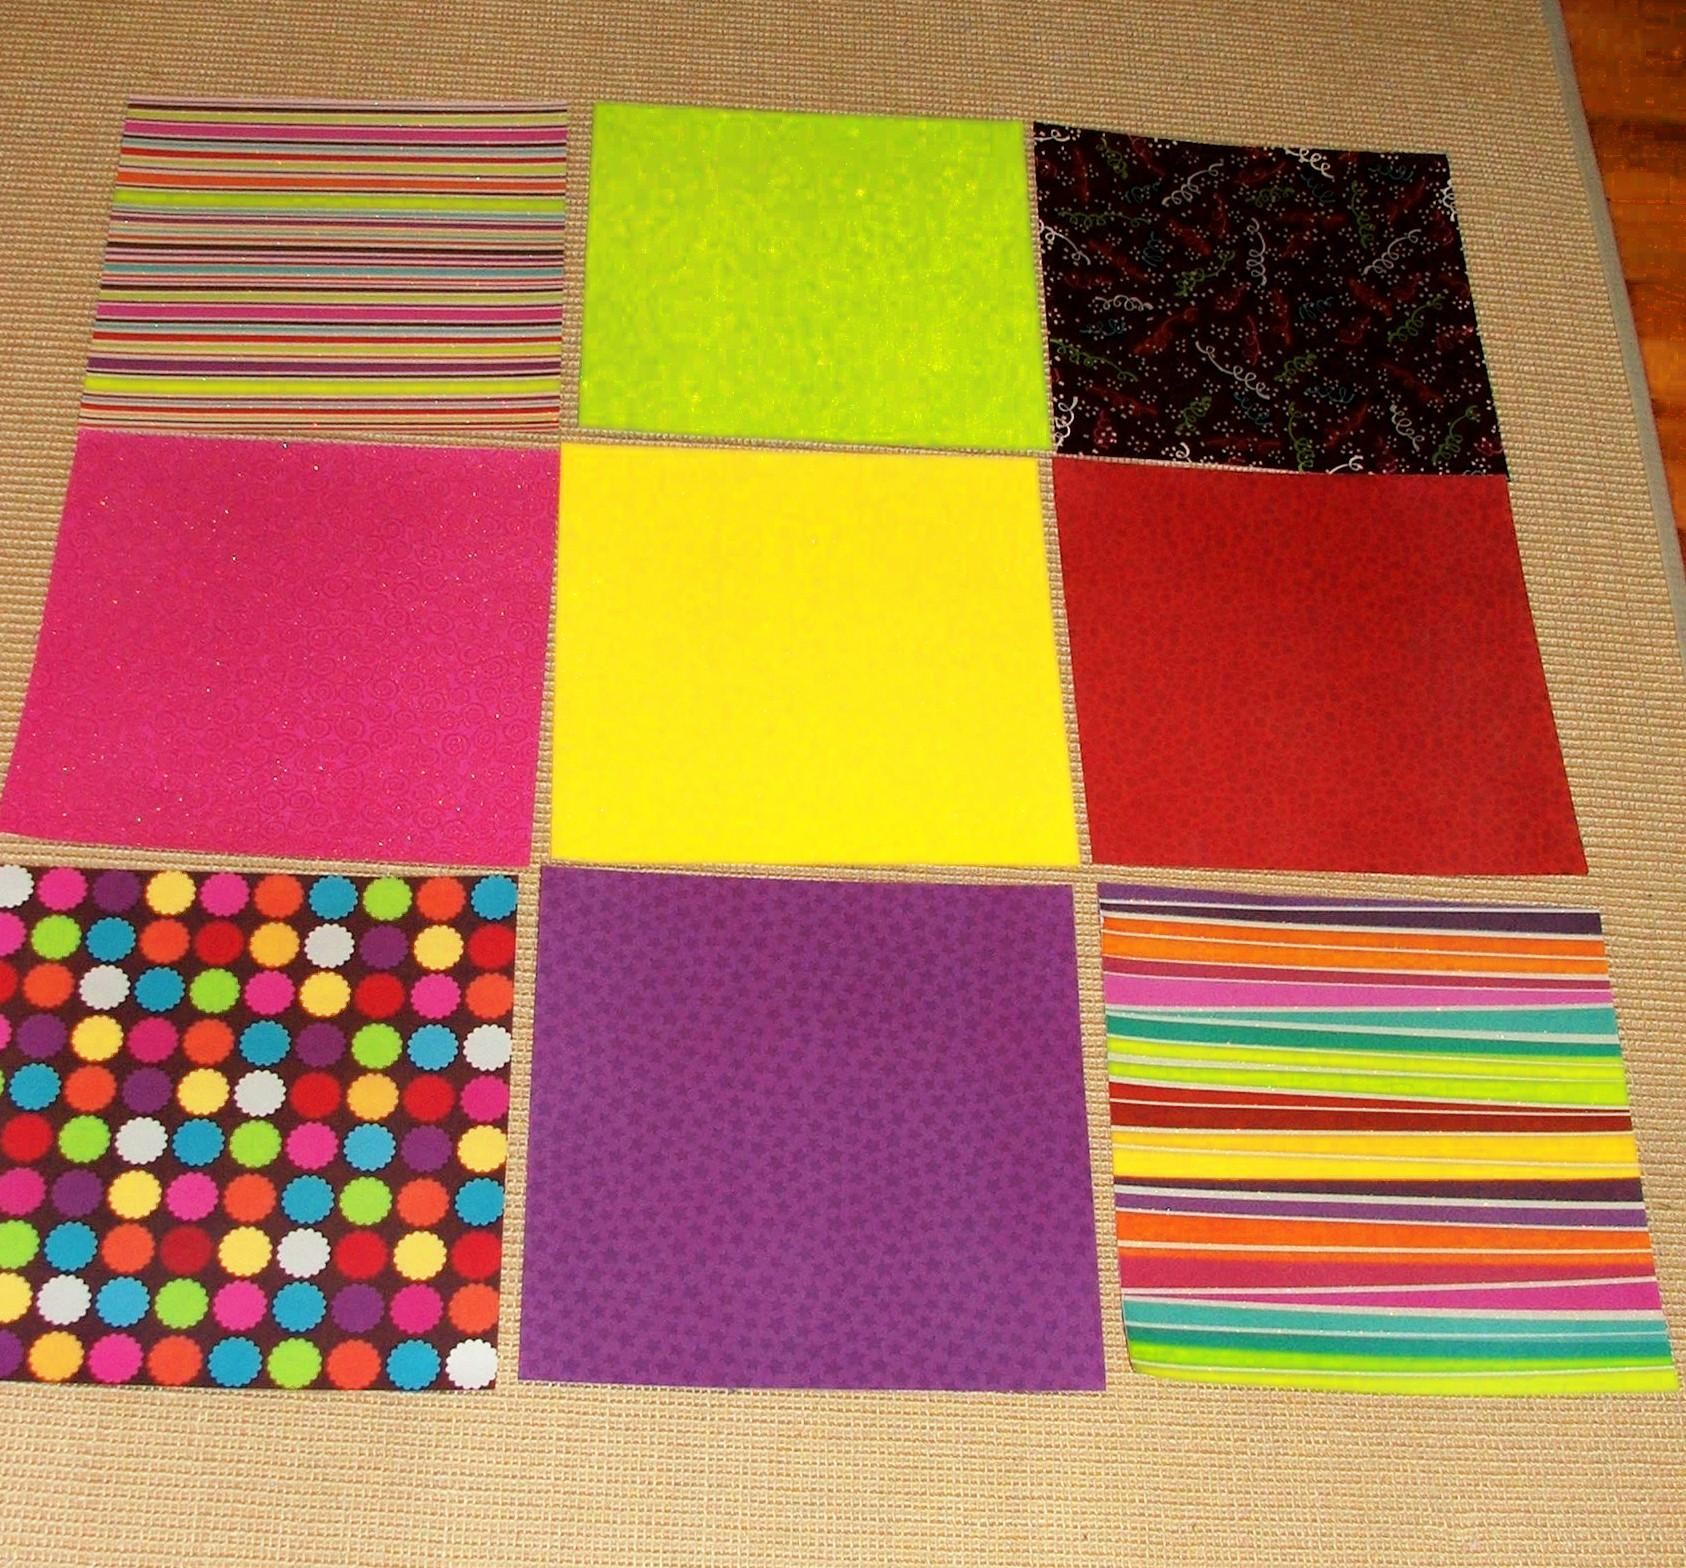 How to make scrapbook paper designs - 3